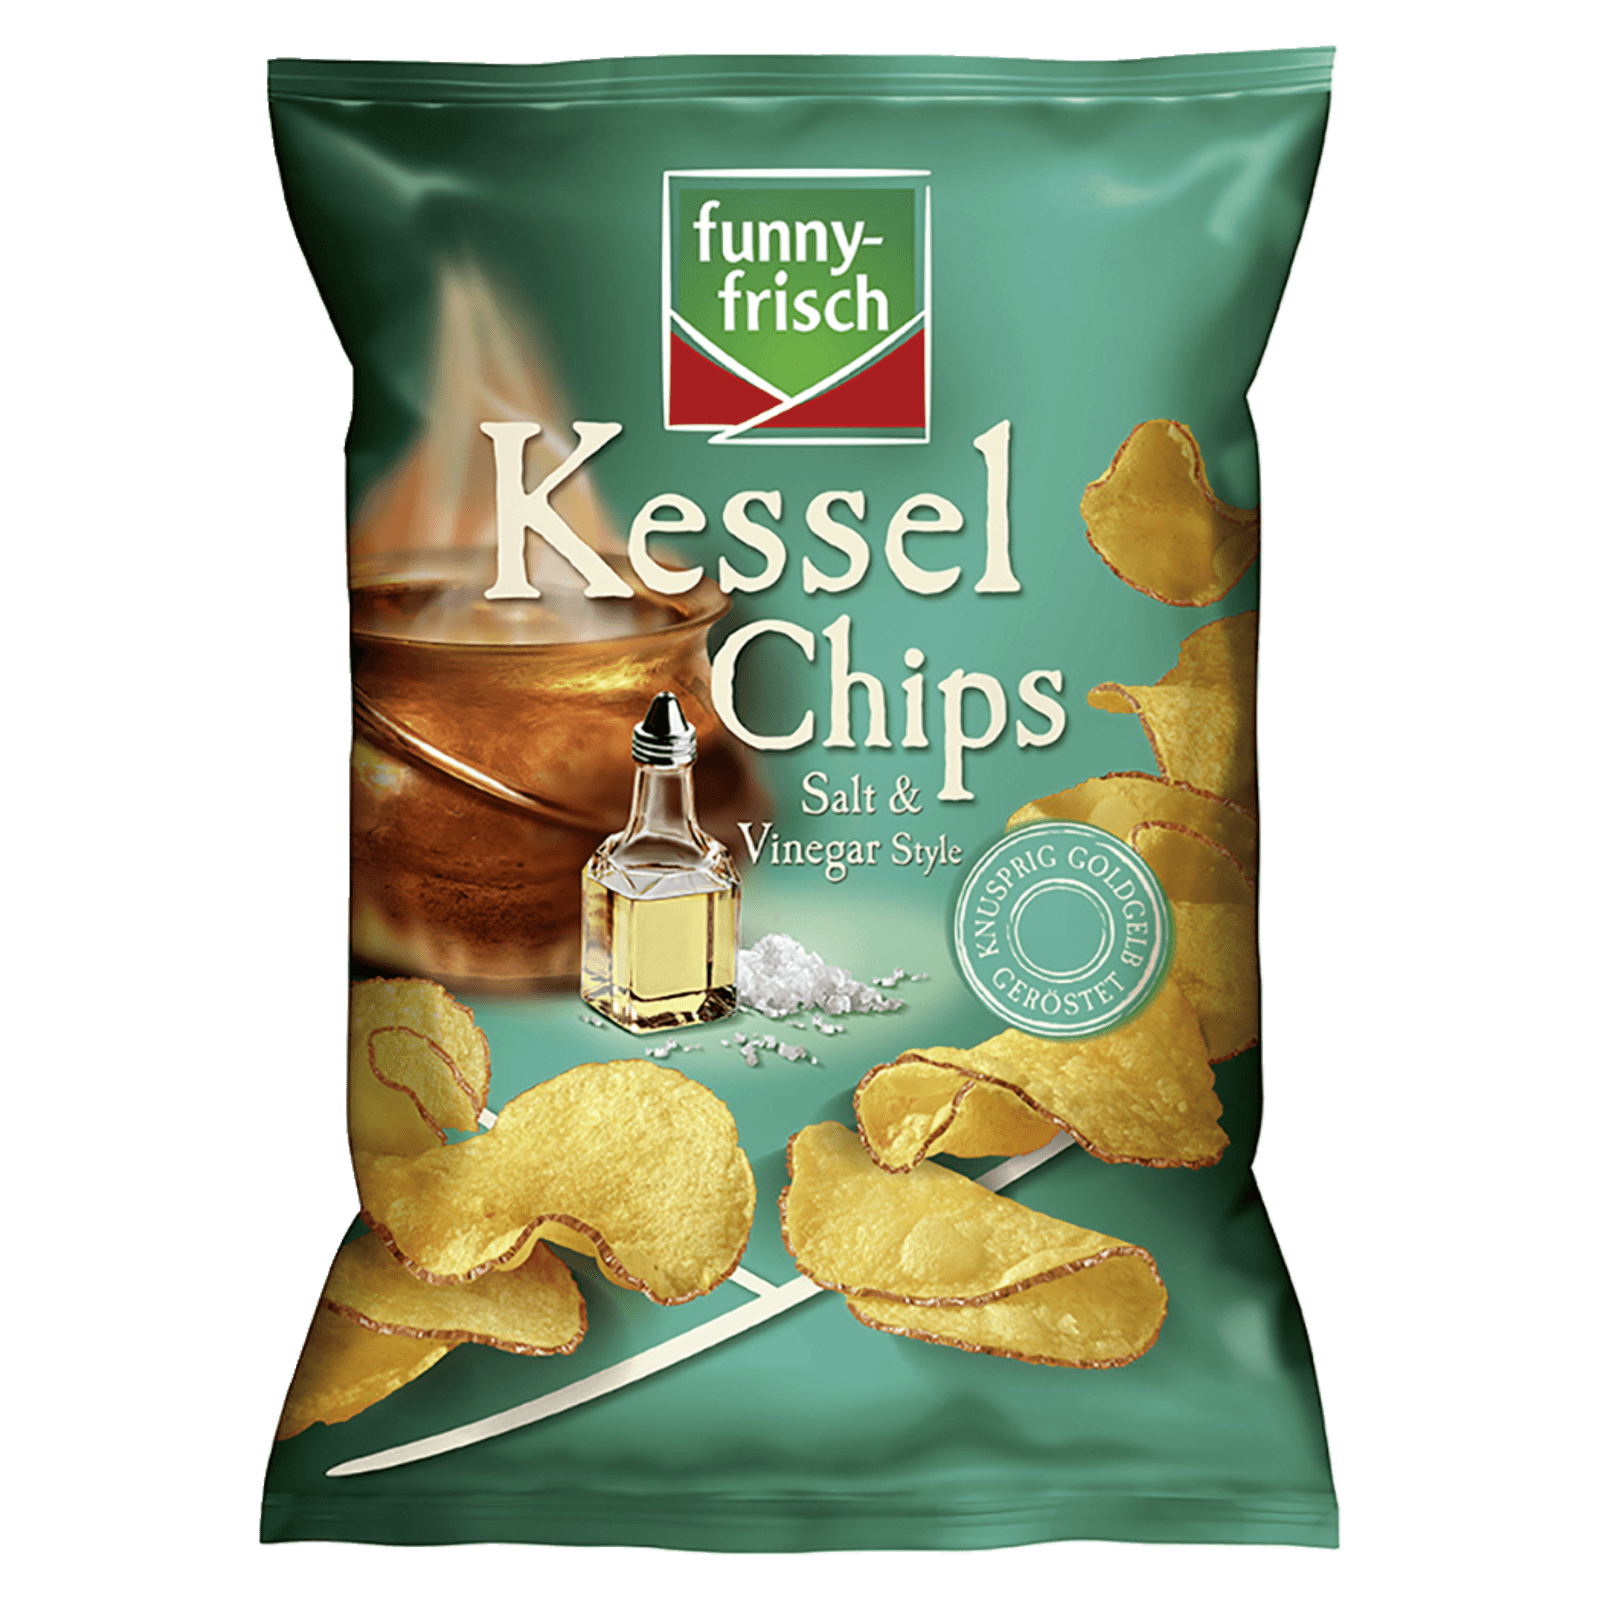 Funny-frisch Kessel Chips Salt & Vinegar 120g